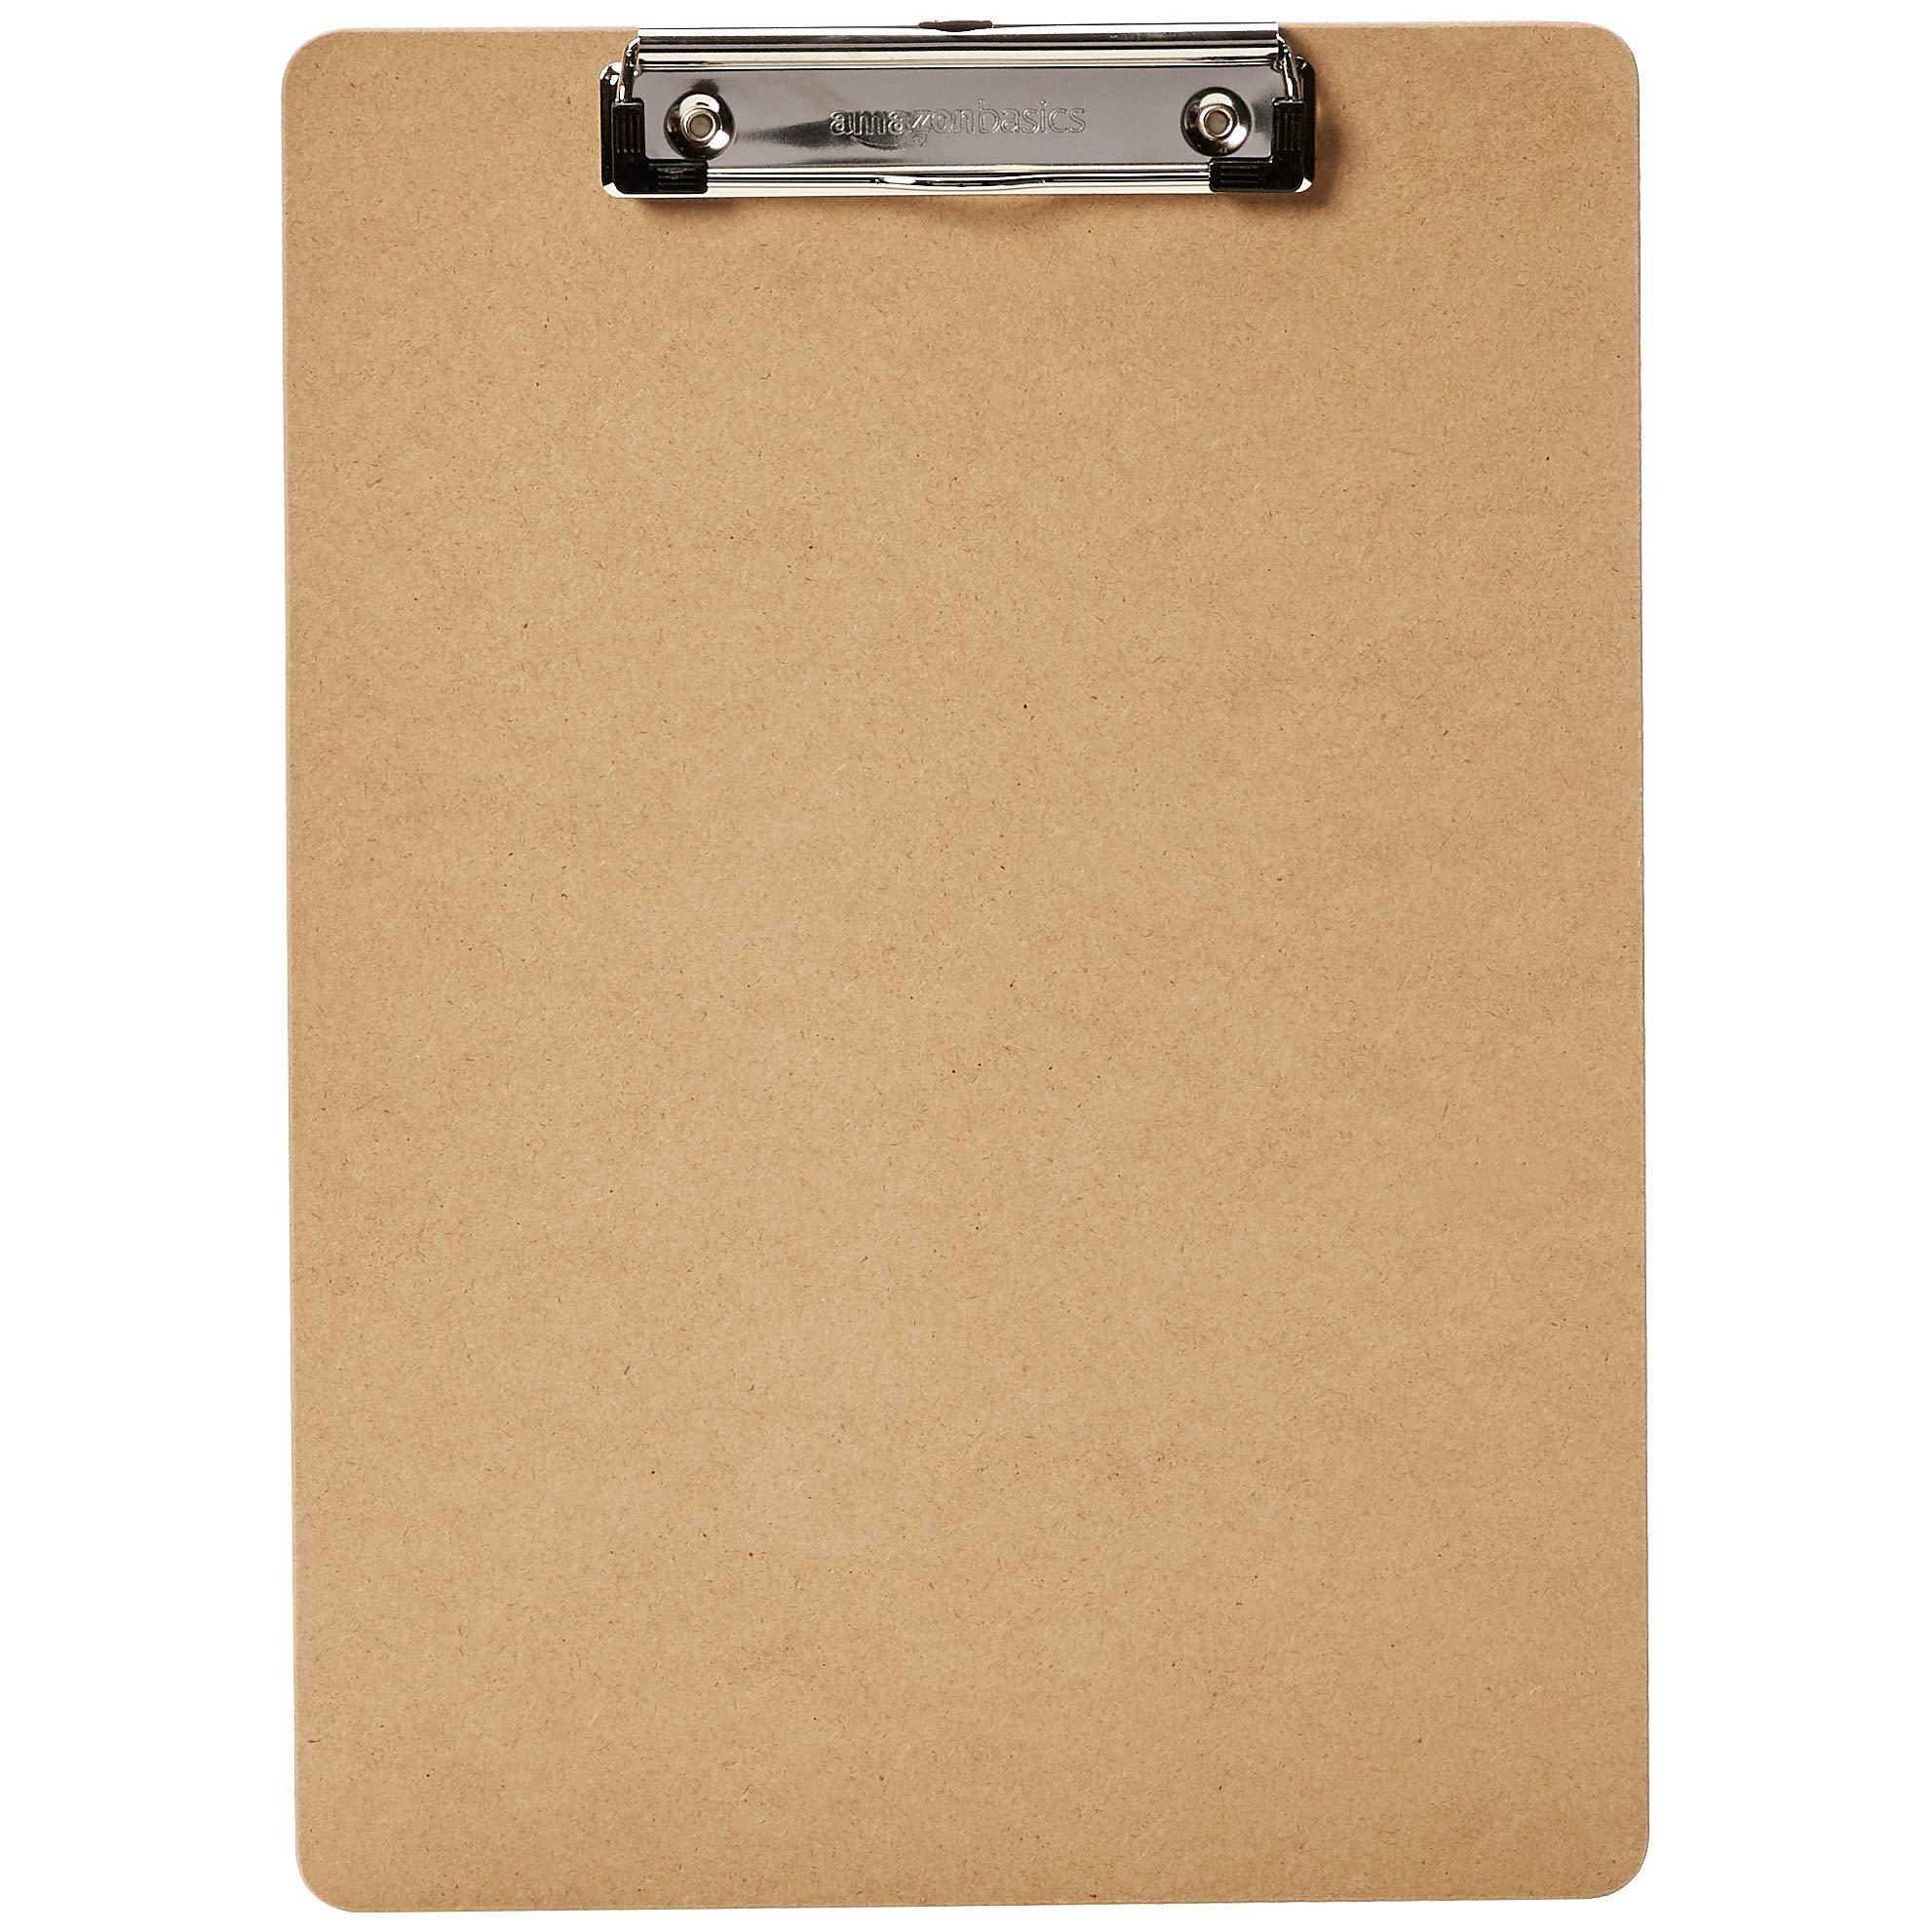 AmazonBasics Hardboard Office Clipboard - 30-Pack by AmazonBasics